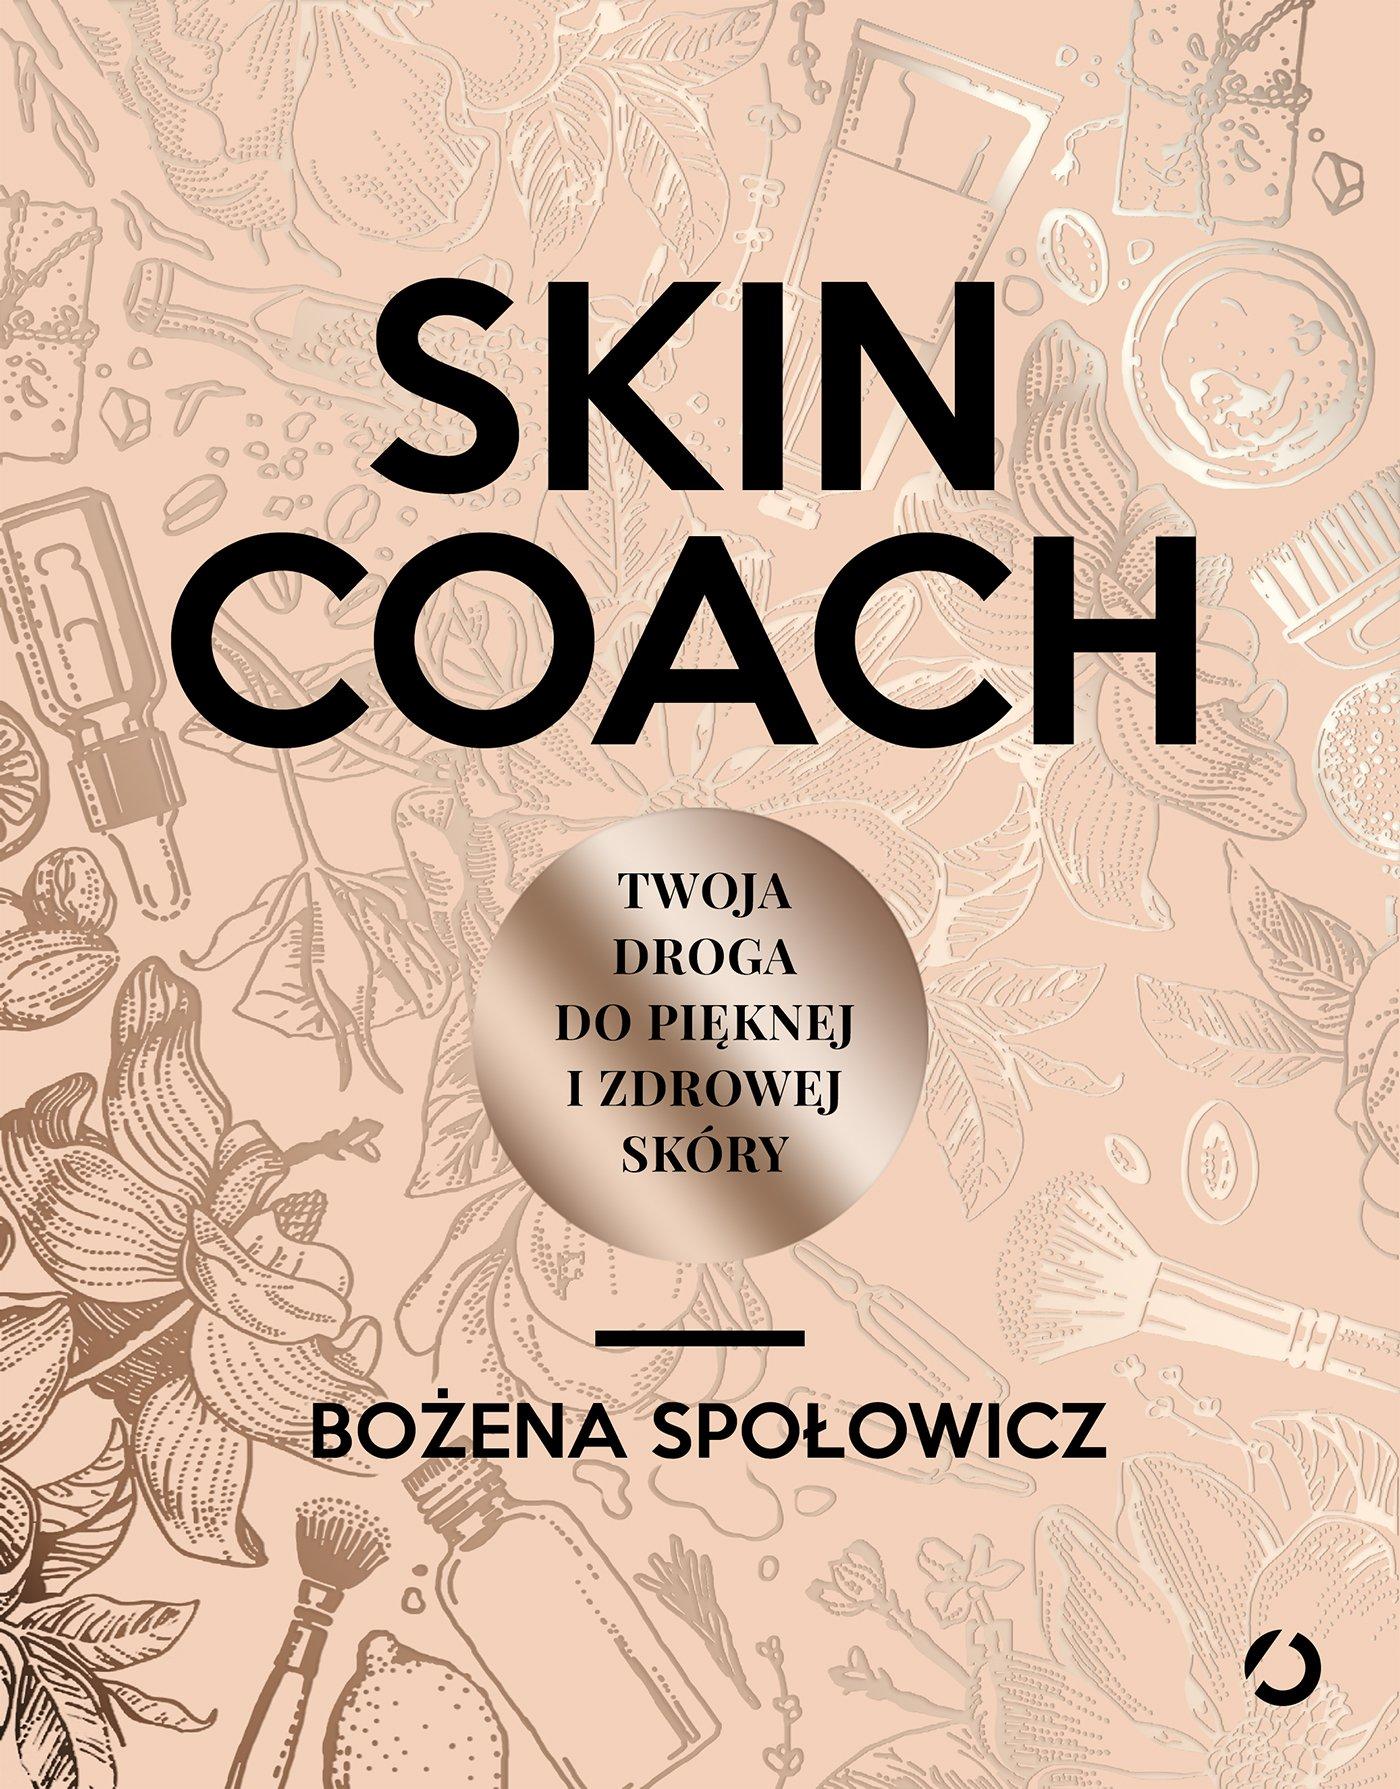 Skin coach (Polacco) Copertina flessibile – 1 gen 2017 Bozena Spolowicz Otwarte 8375152757 MEDICAL / Dermatology